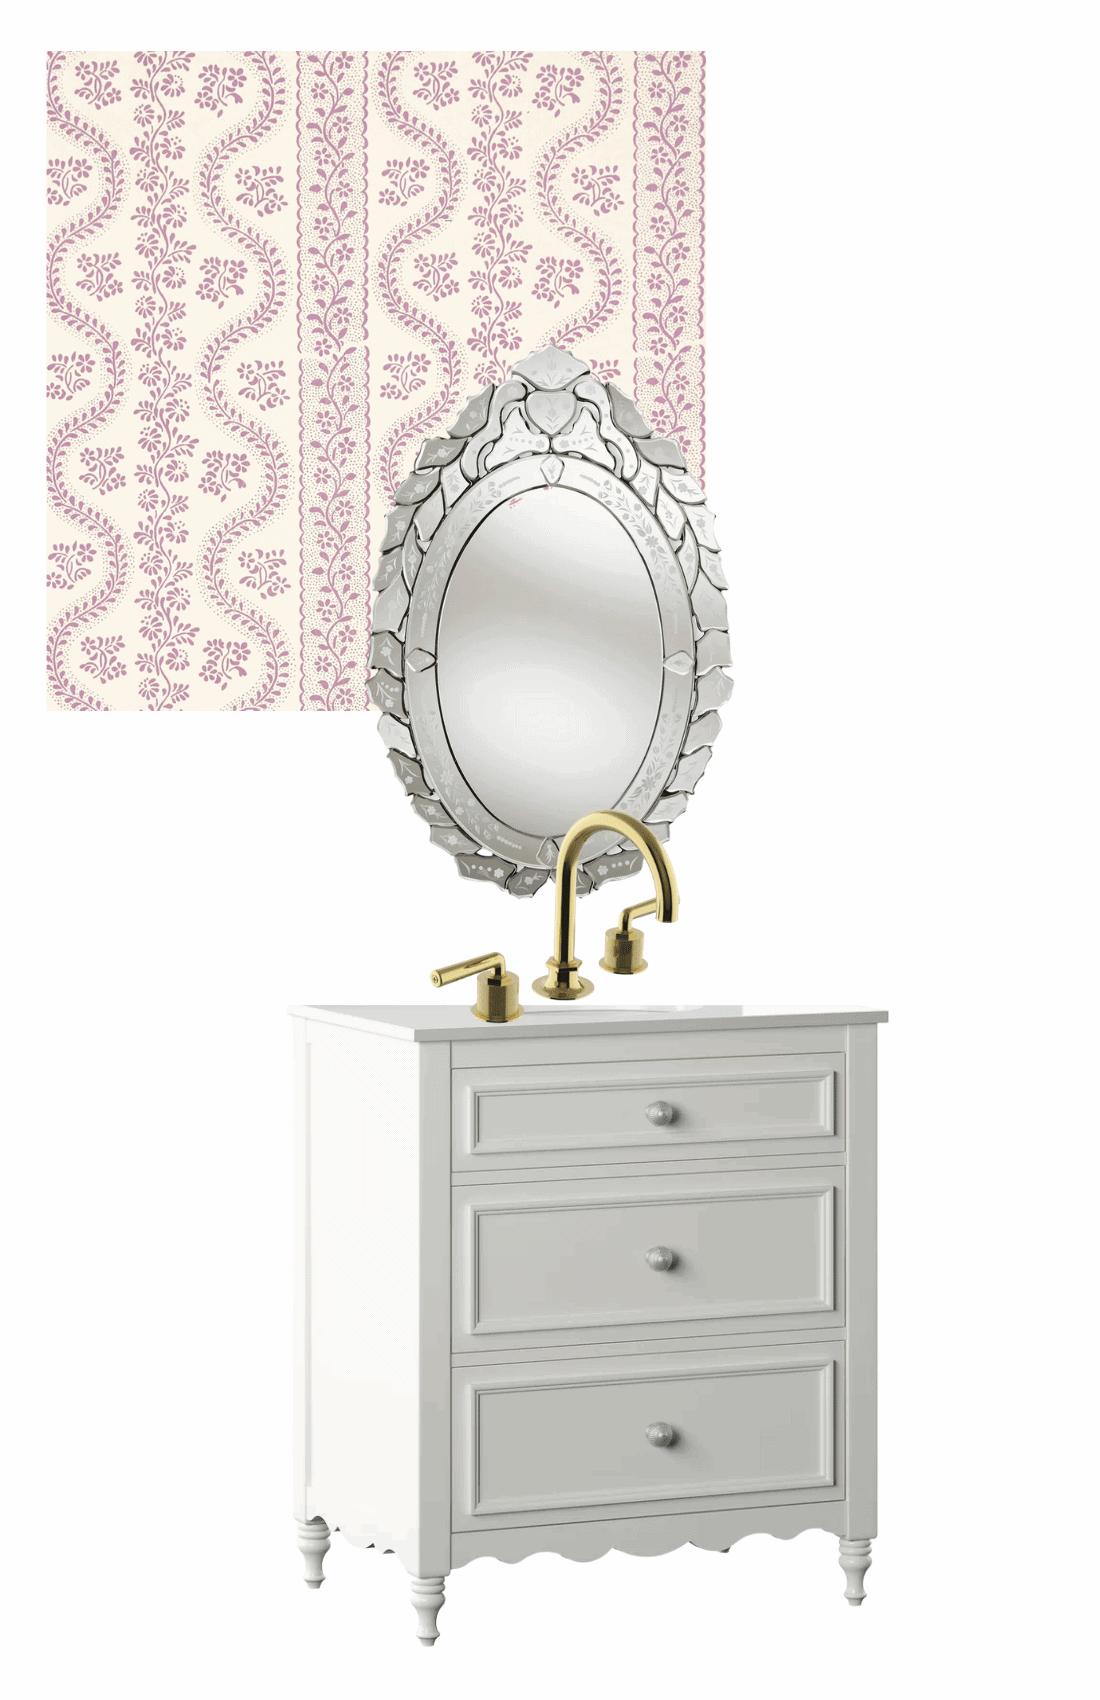 bathroom-vanity-mockup